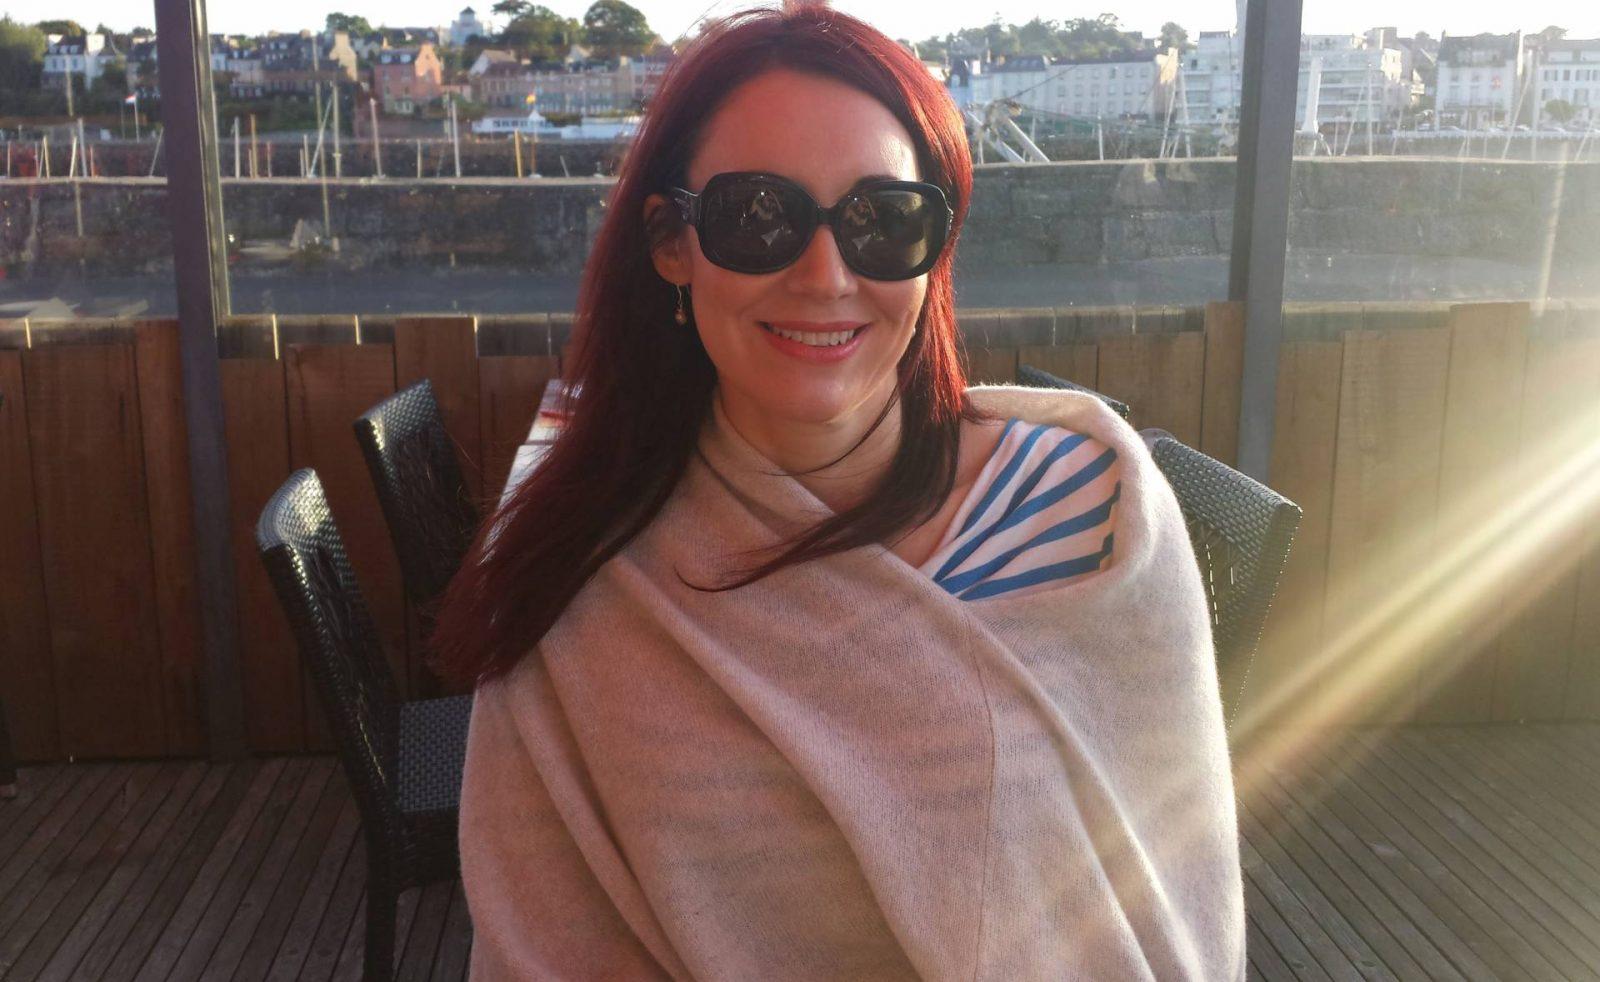 Nautical Chic Breton Stripes Asos Culottes Hope pashmina